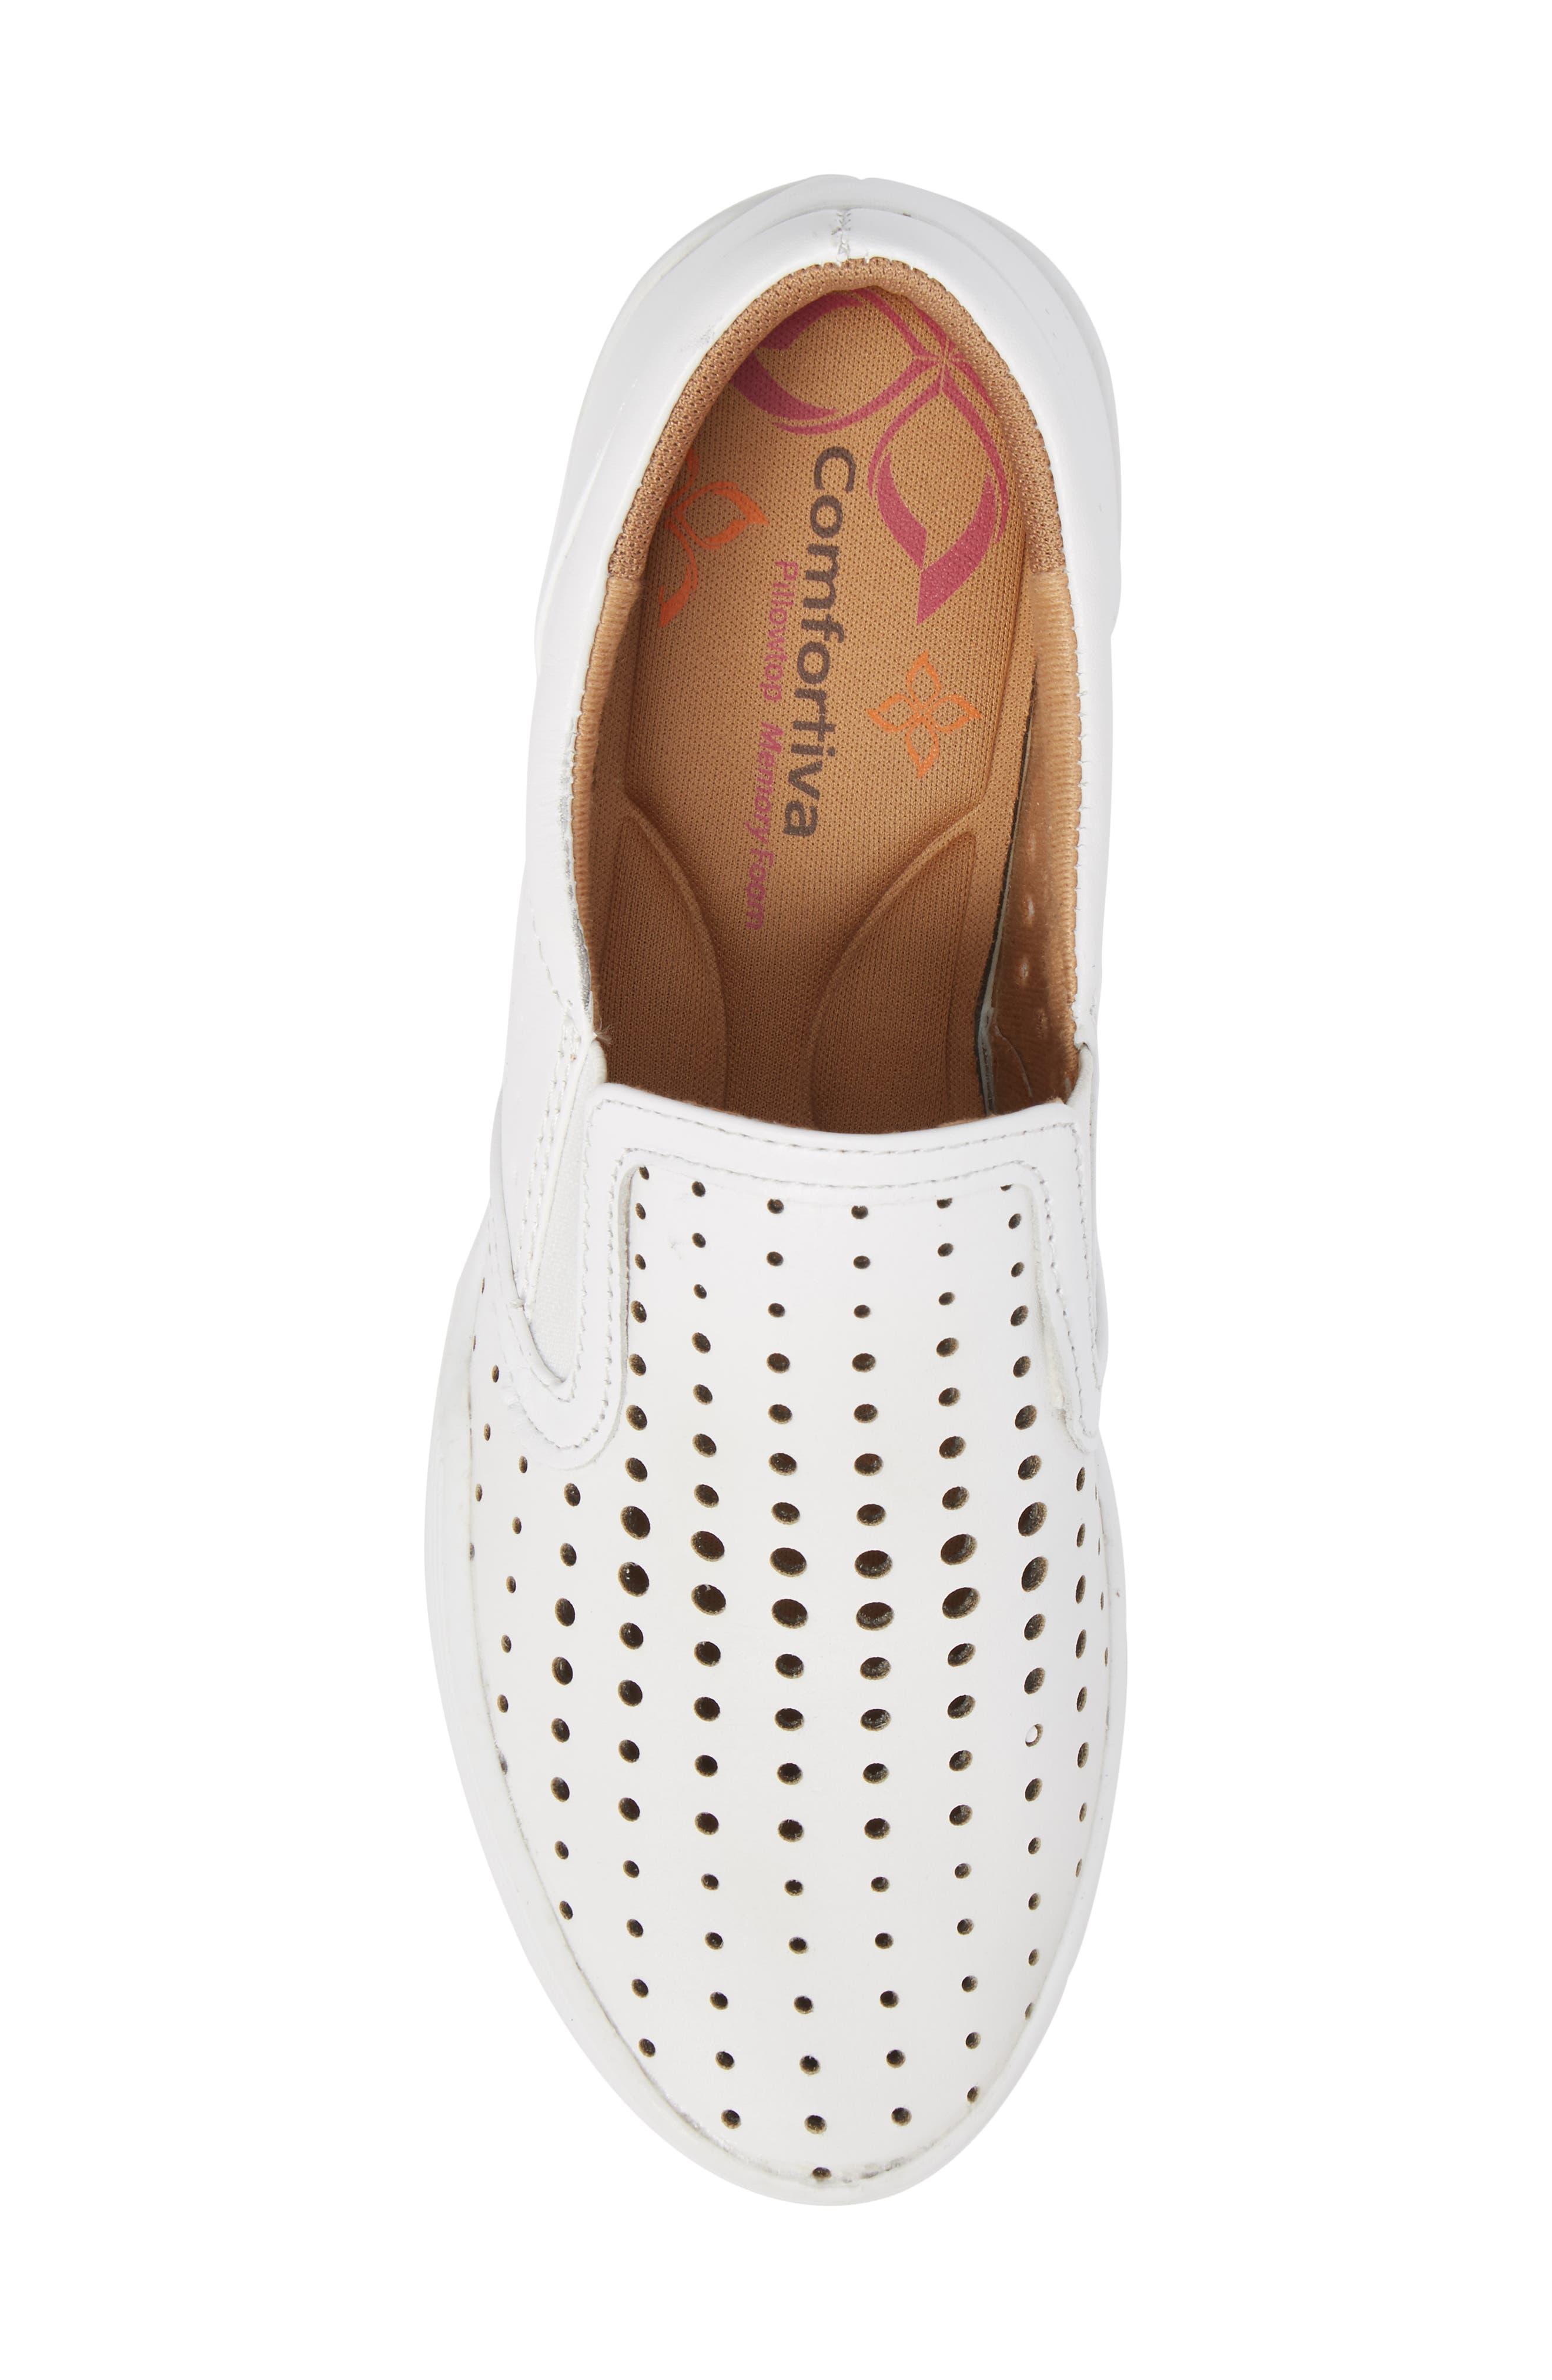 Lyra Perforated Slip-On Sneaker,                             Alternate thumbnail 5, color,                             White Leather